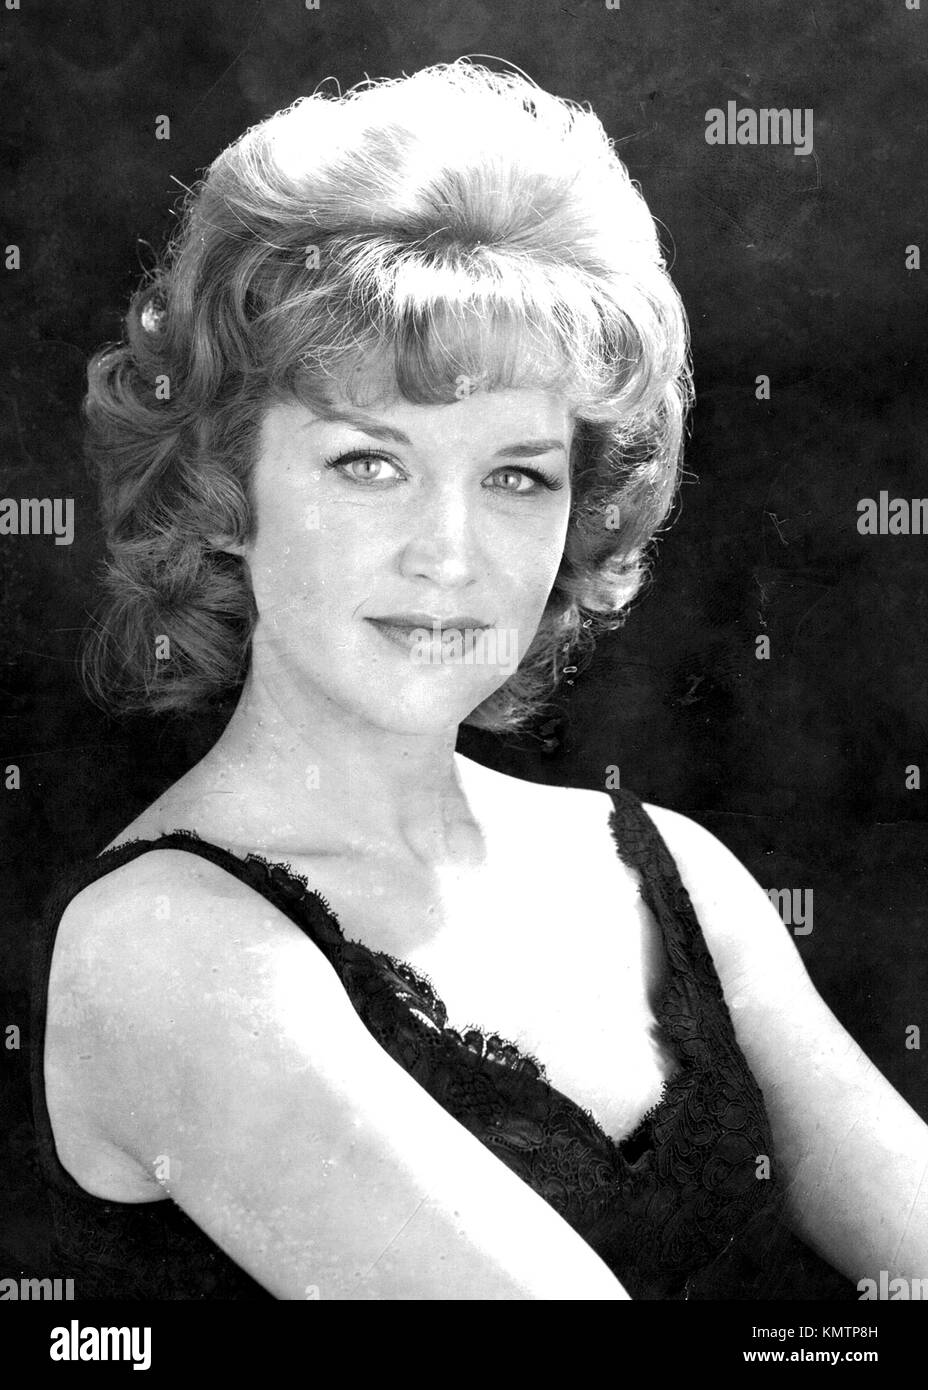 DEBBIE DEAN (1928-2001) American singer about 1964 - Stock Image